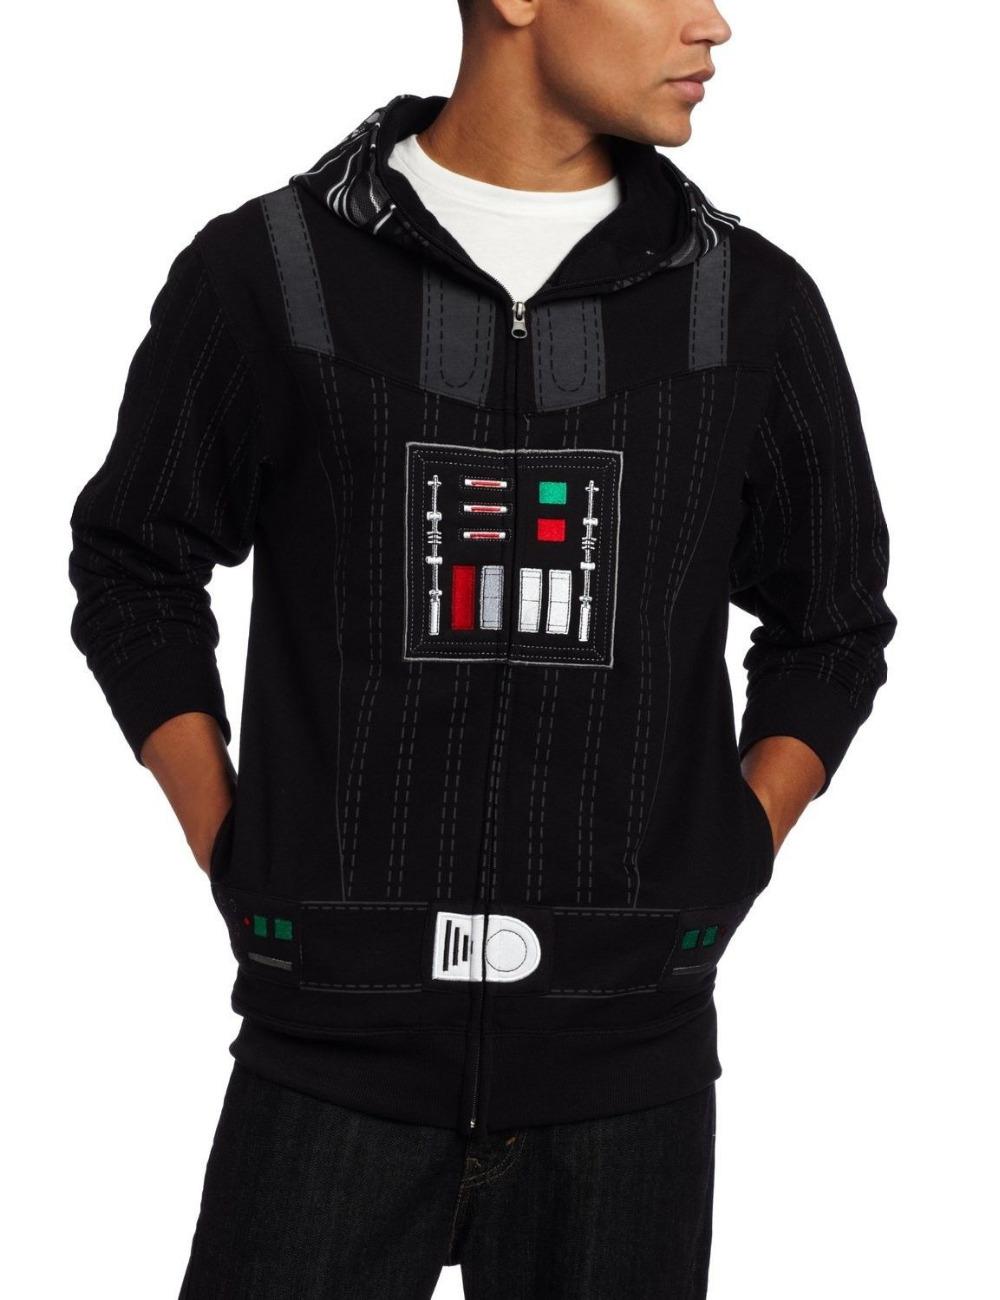 STAR WARS Han Solo Darth VADER Yoda movie Jacket MEN/'S New HOODIE Sweat SHIRT